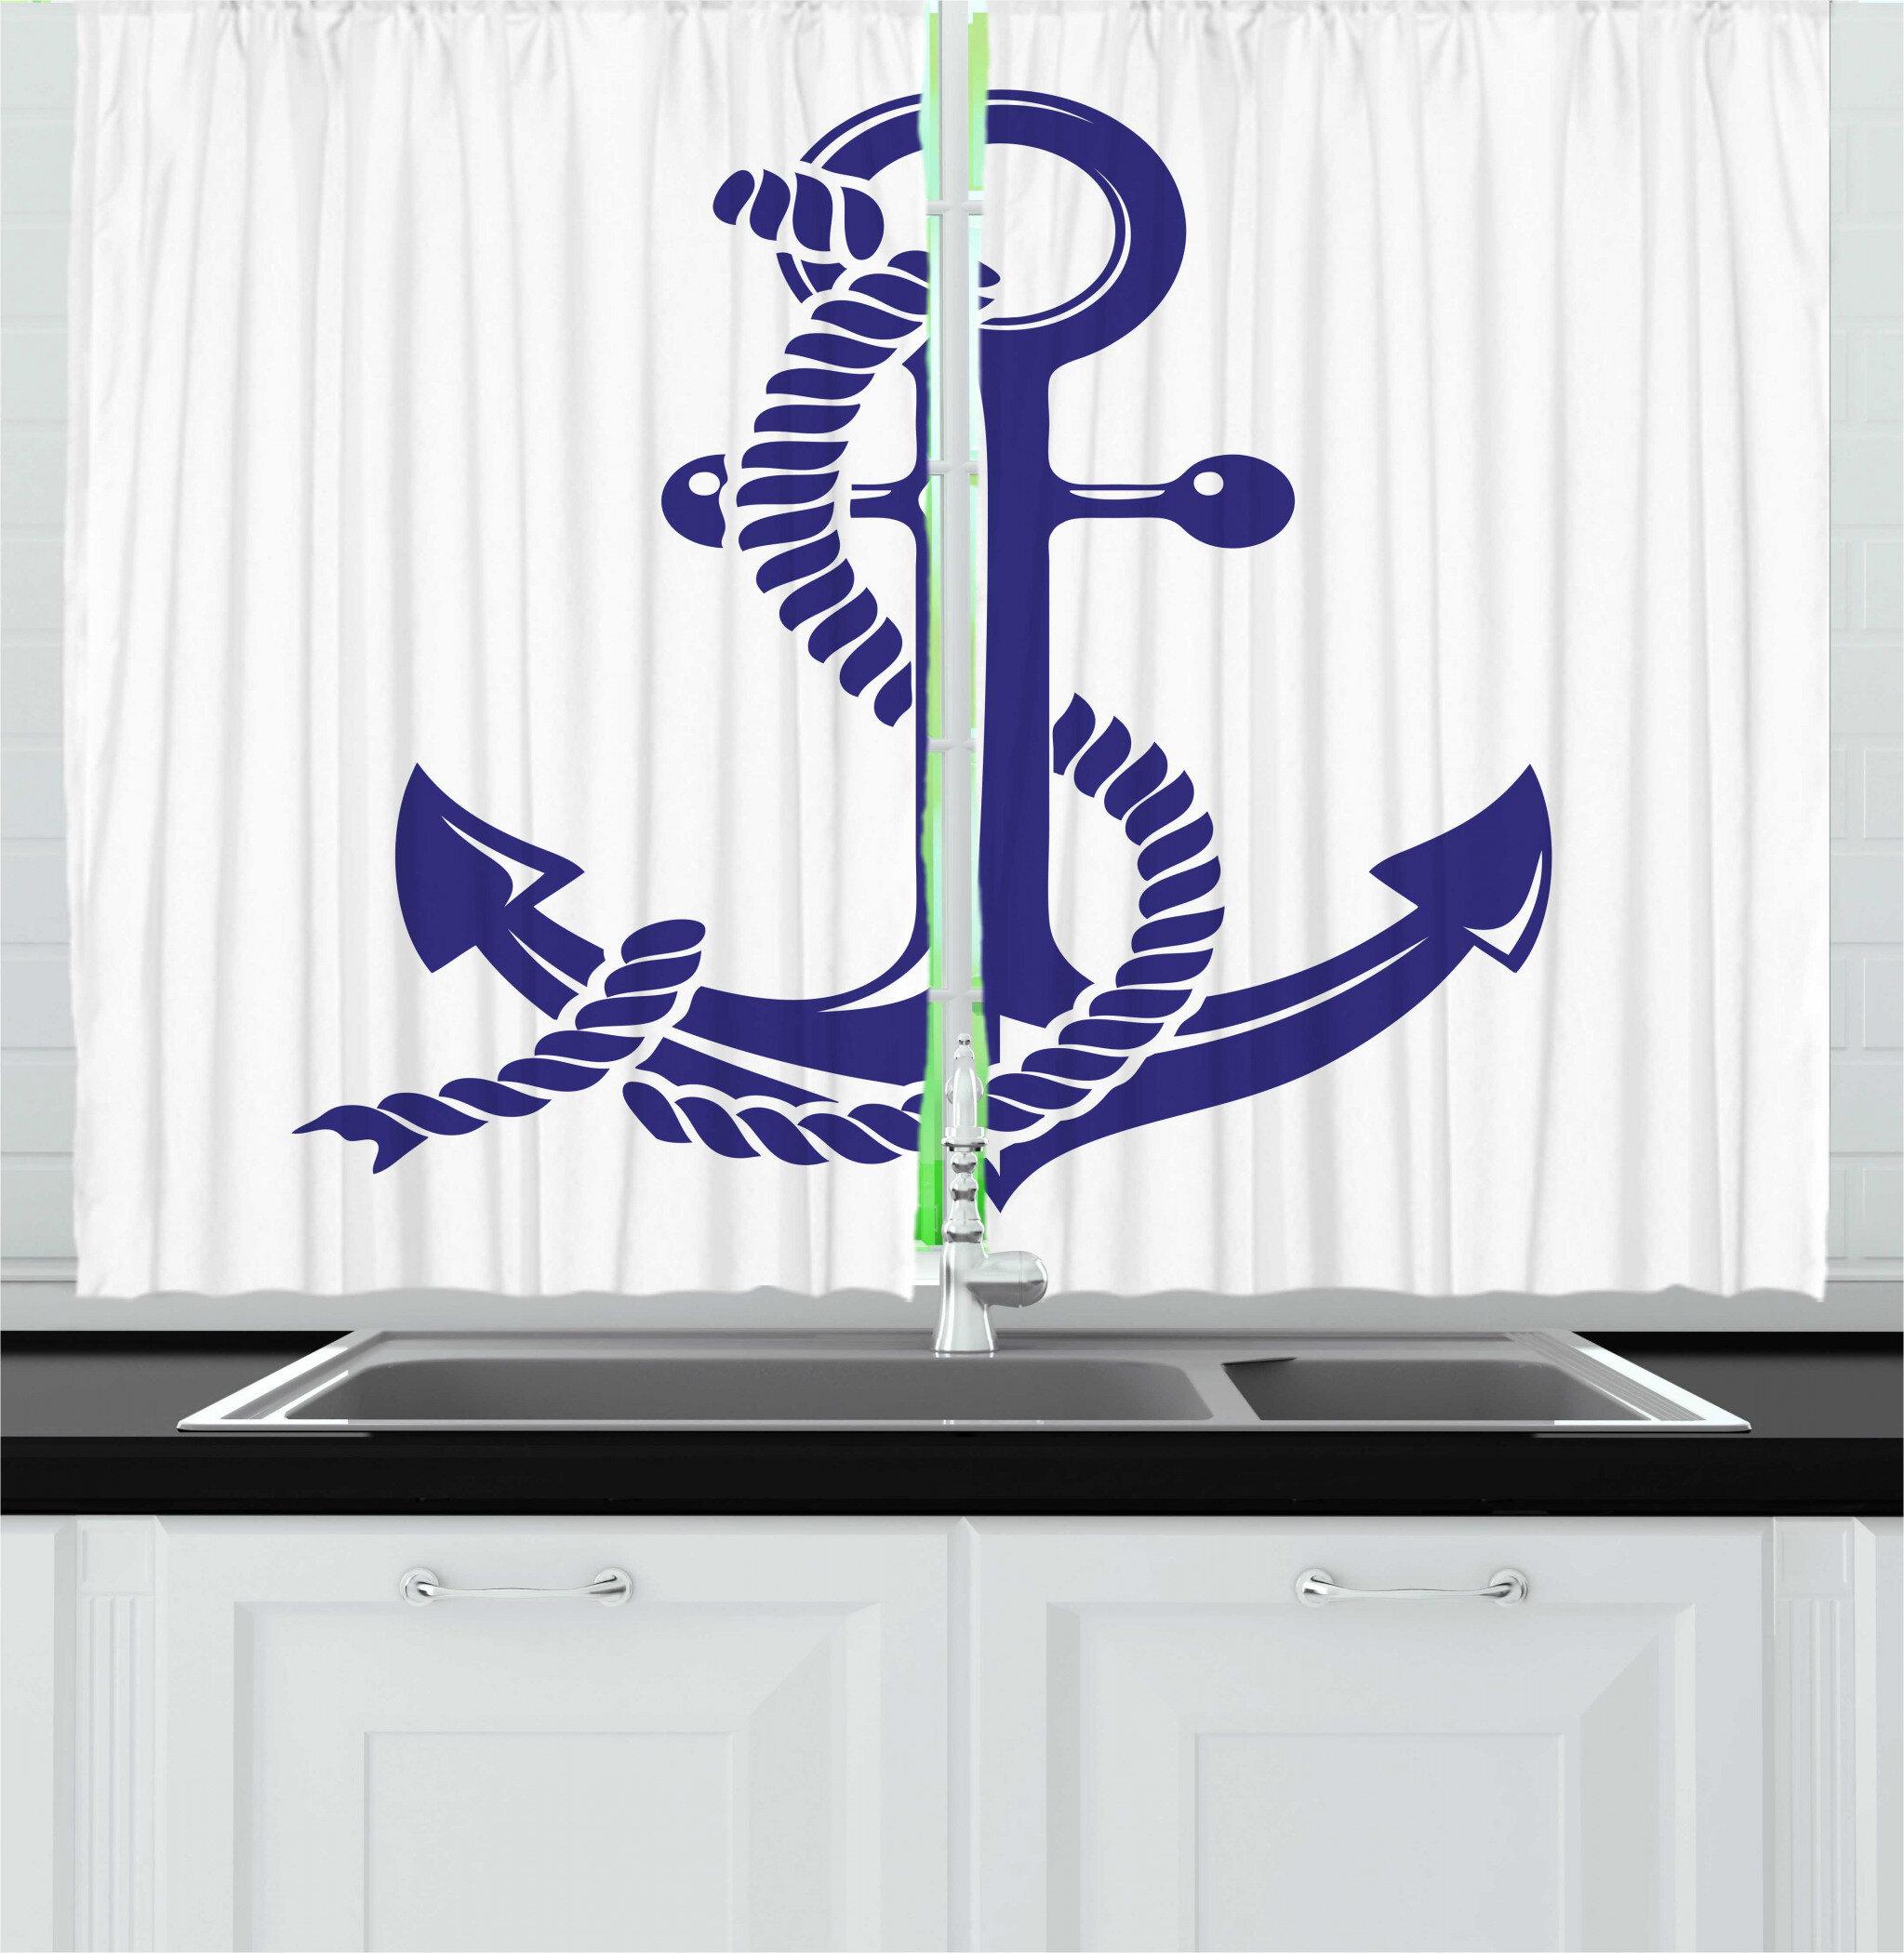 East Urban Home 2 Piece Maritime Nautical Symbol Monochrome Design Rope And Anchor Illustration Kitchen Curtain Set Wayfair